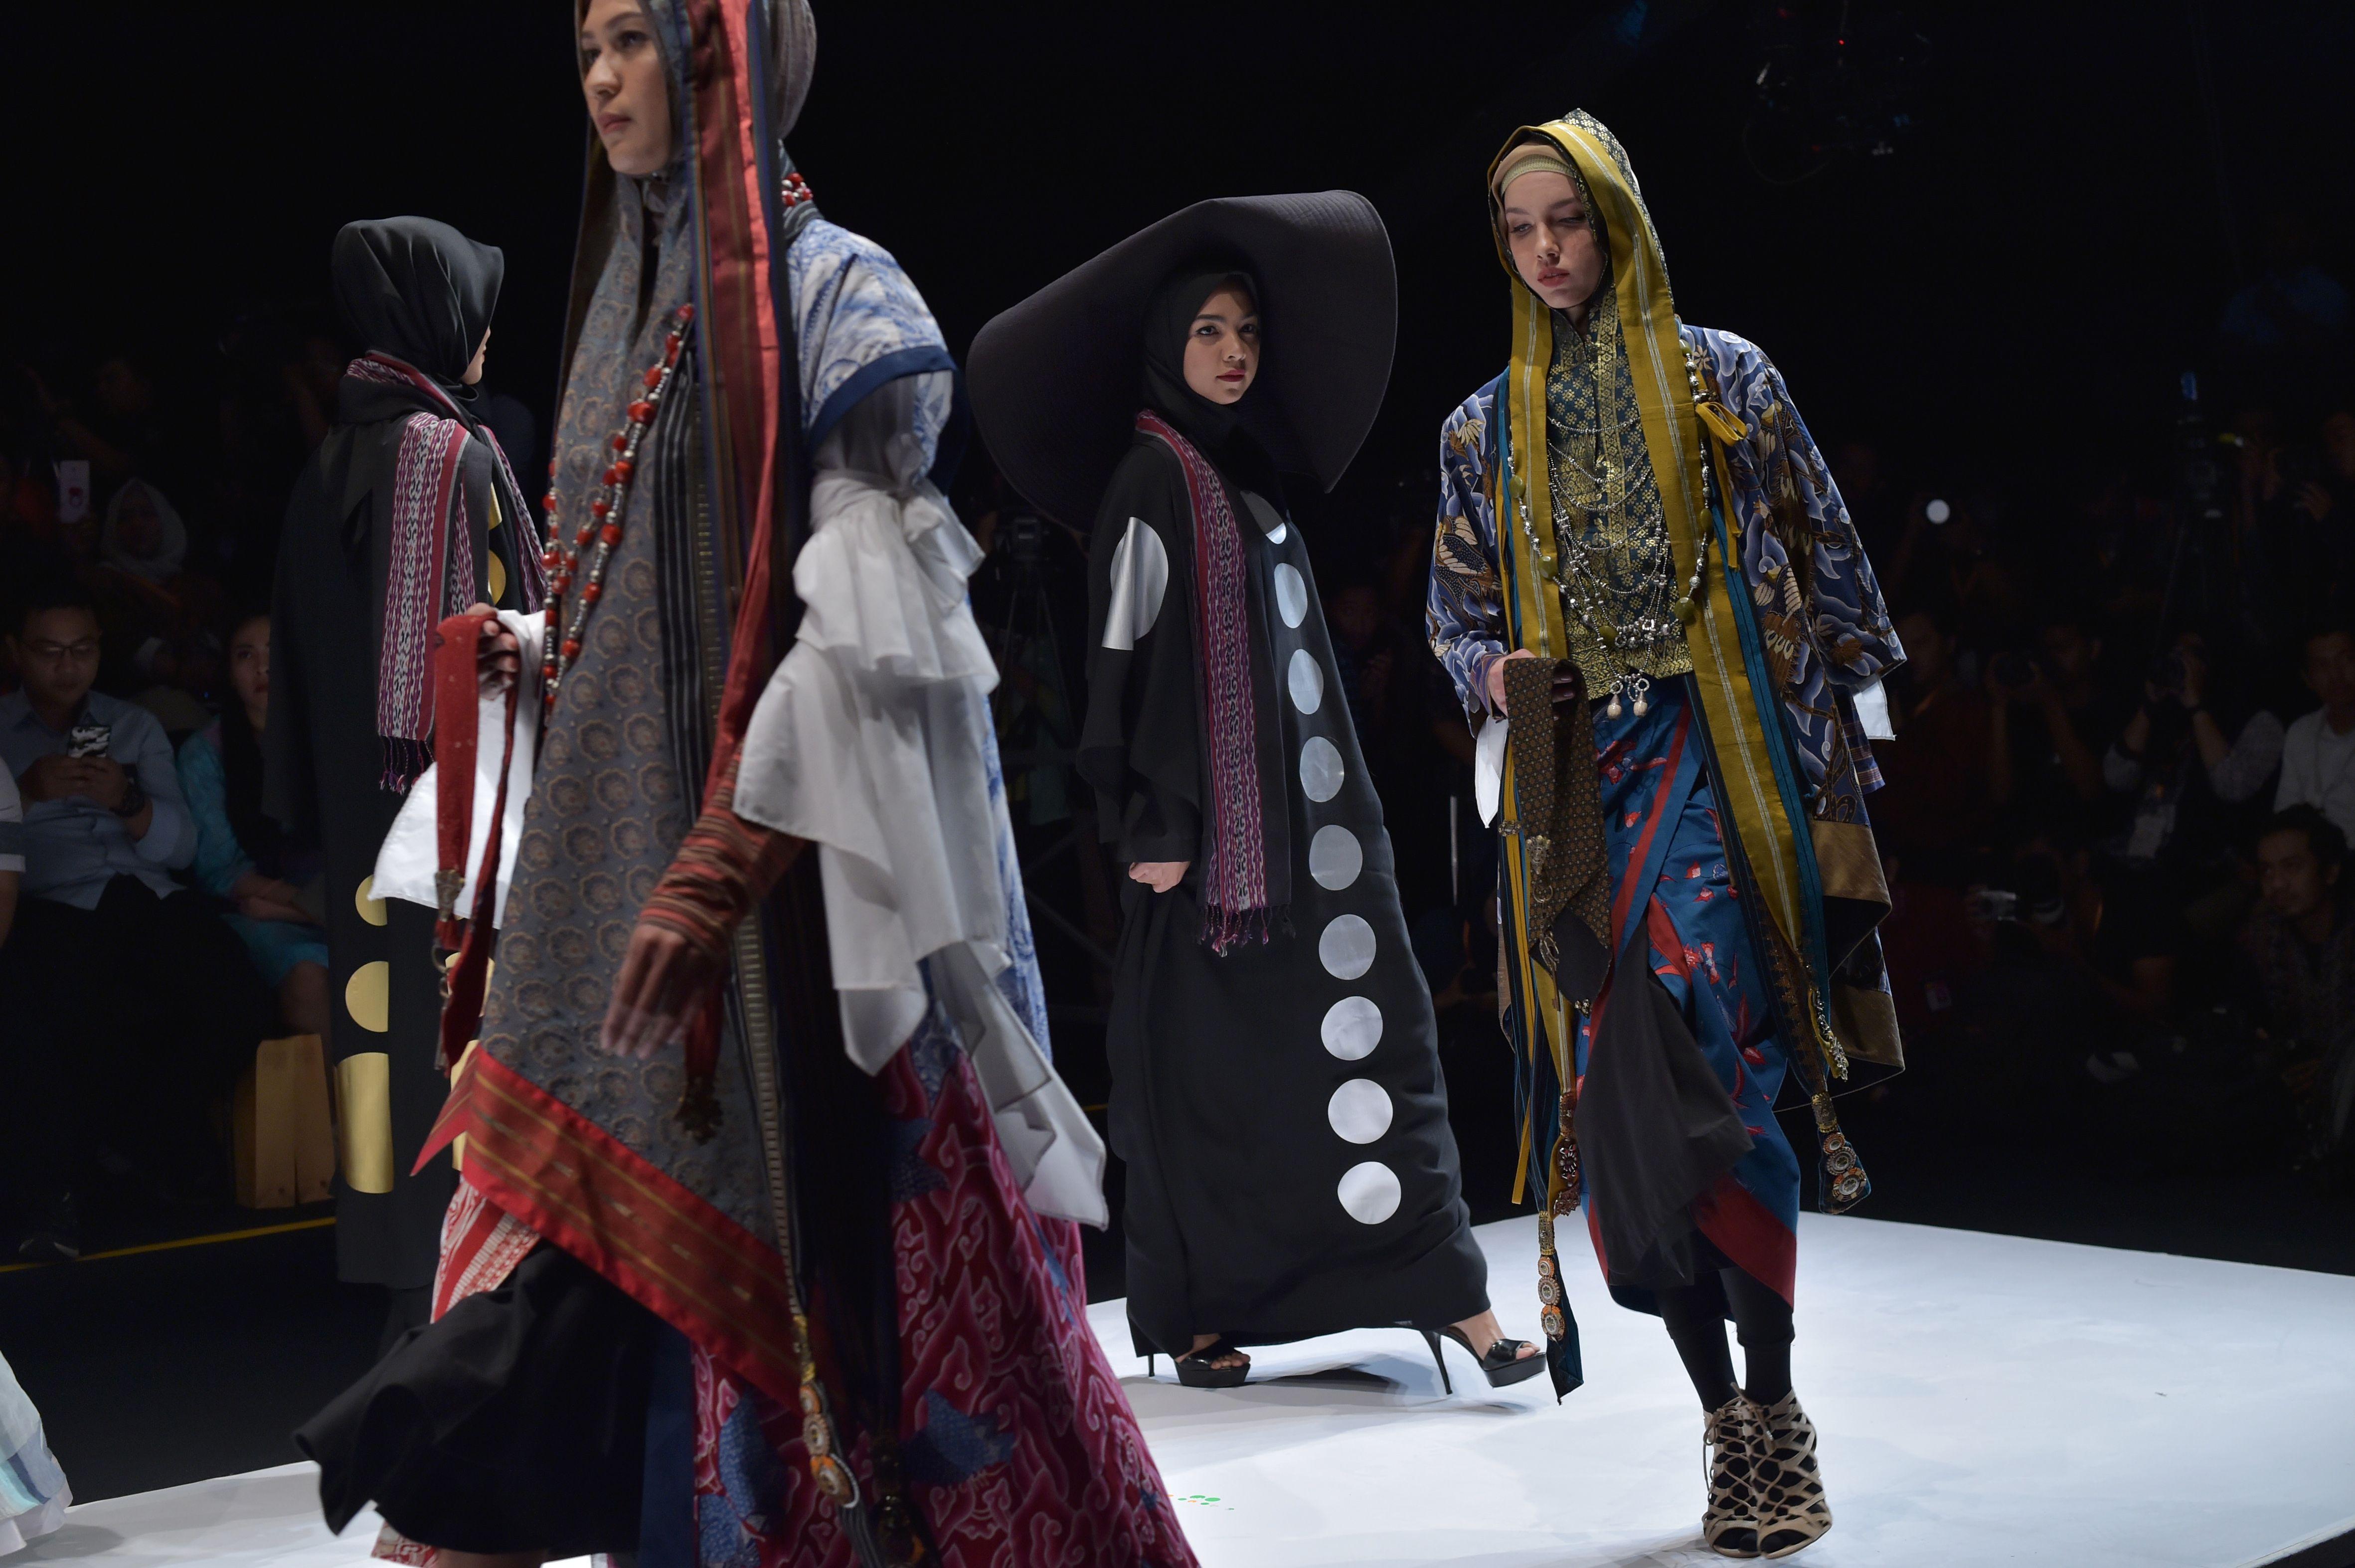 378eb0112 صور.. عباءات ولفات طرح مختلفة بمهرجان الأزياء الإسلامية بإندونيسية ...